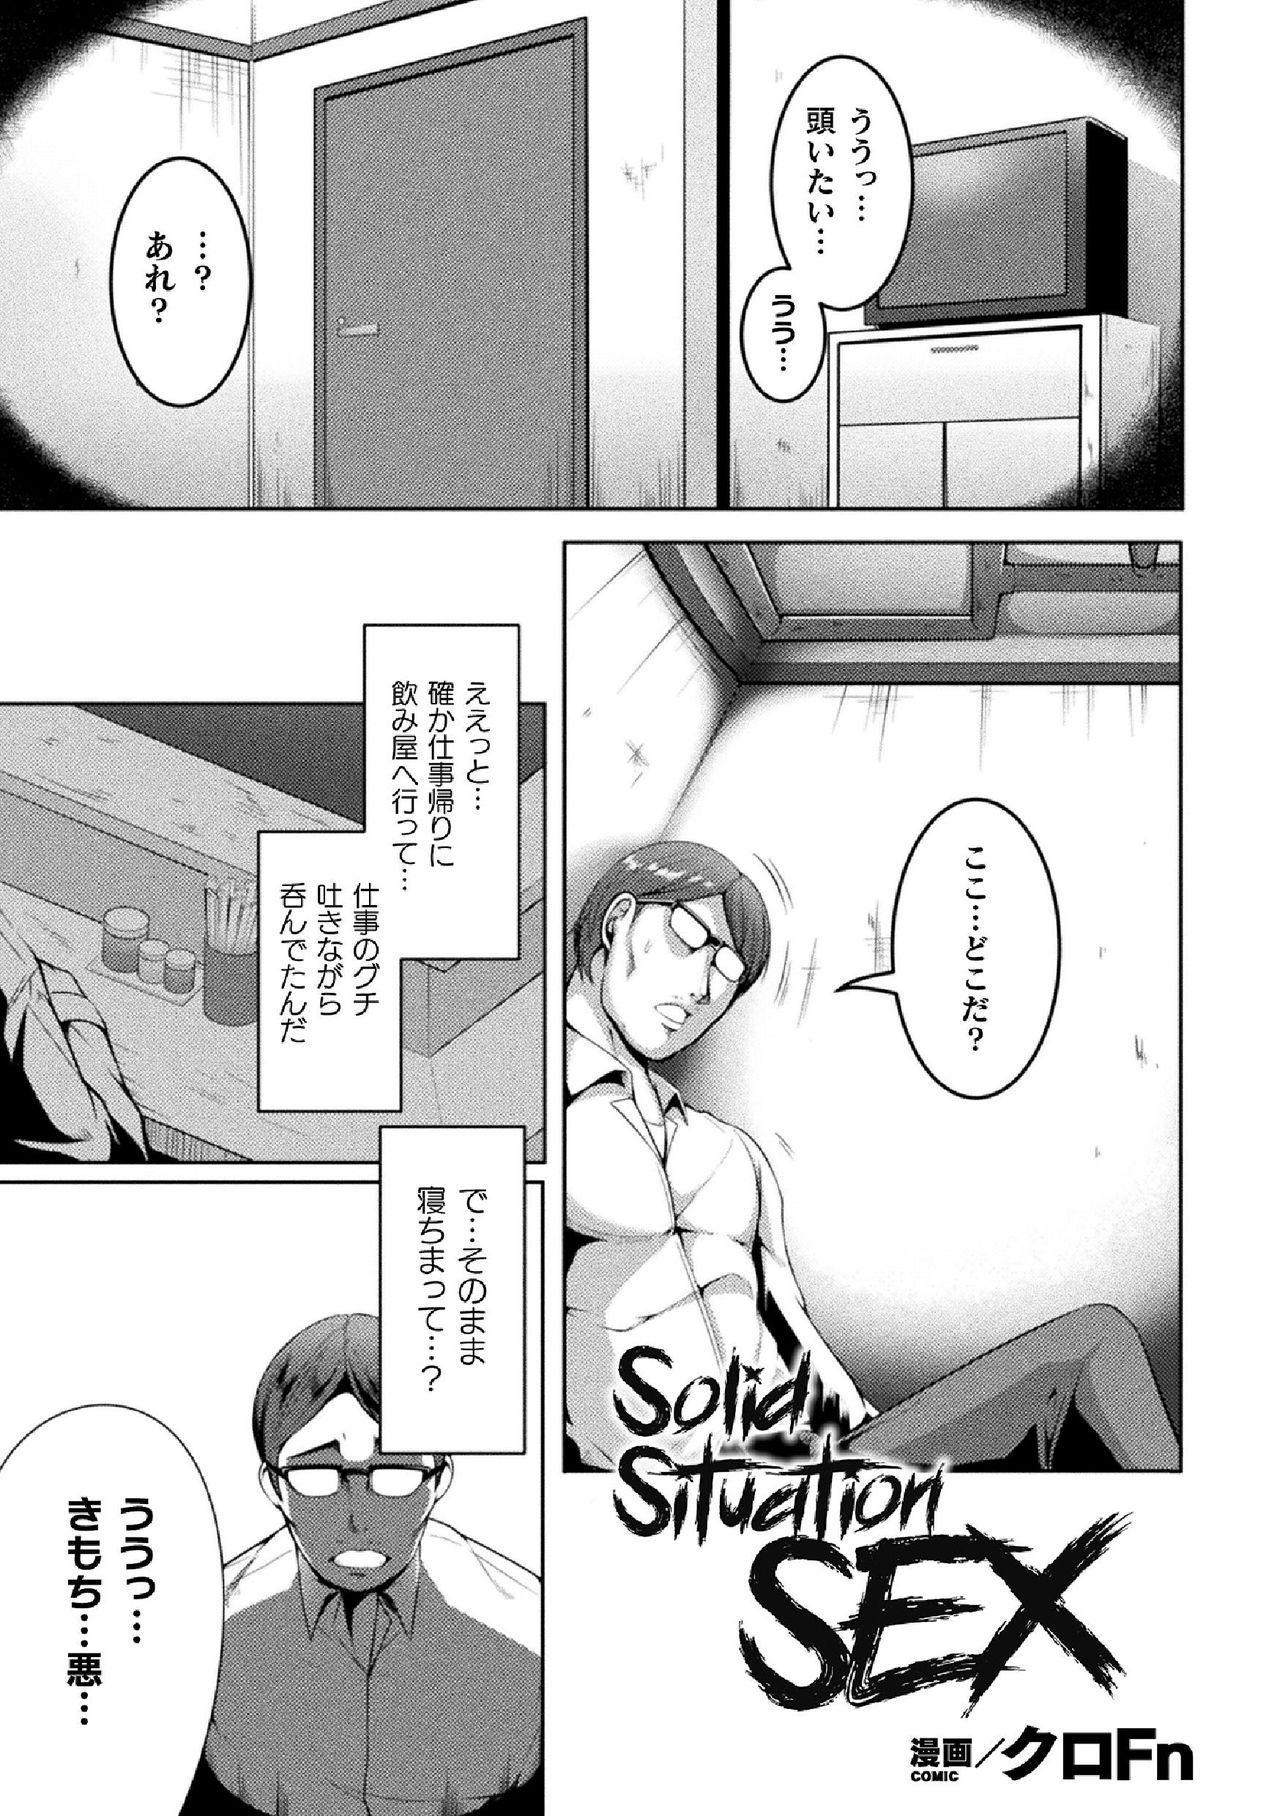 2D Comic Magazine Namaiki Onna ni HaraPun Seisai! Vol. 2 46